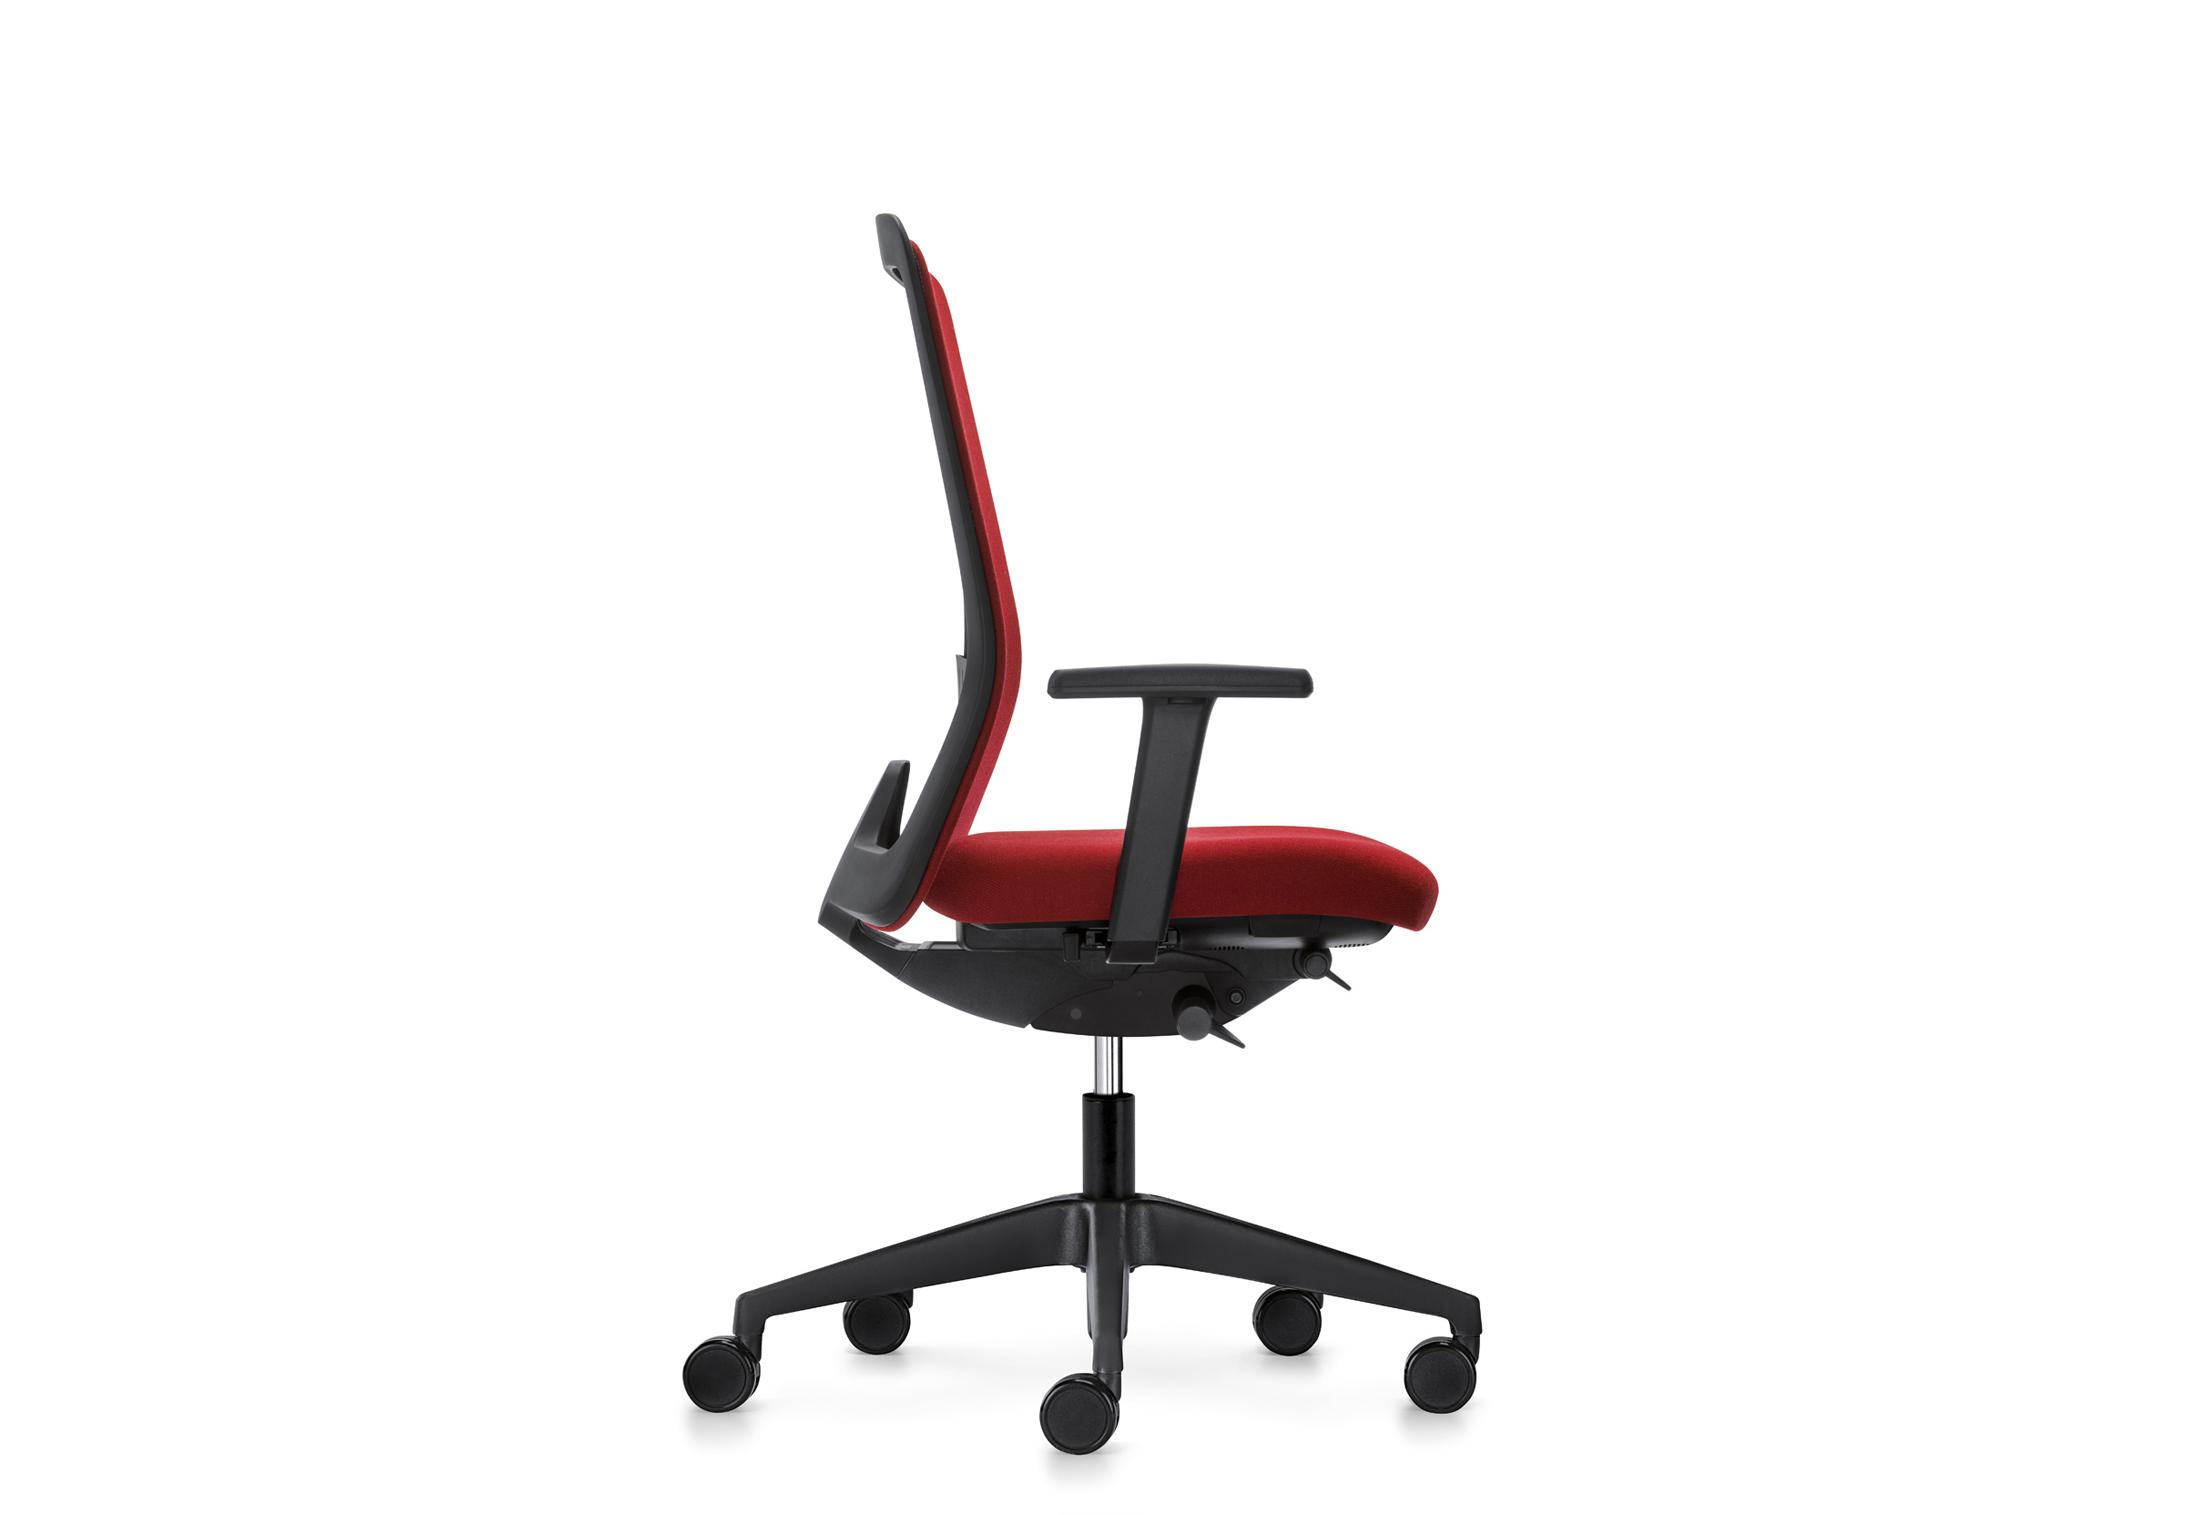 Everyis1 Chillback Swivel Chairinterstuhl | Stylepark Pertaining To Chill Swivel Chairs With Metal Base (Photo 17 of 25)